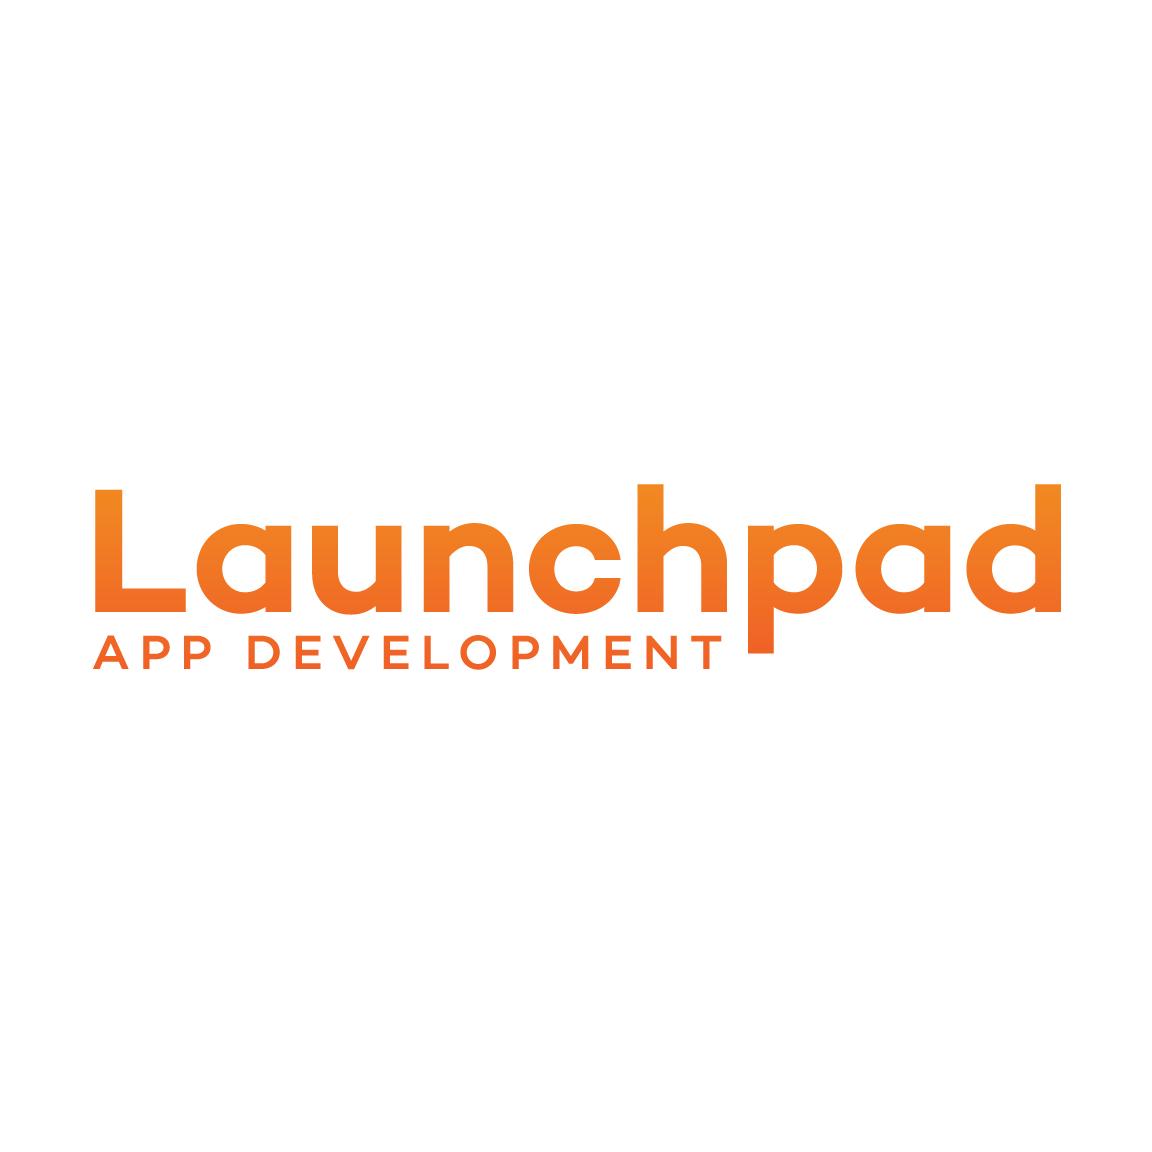 Launchpad App Development